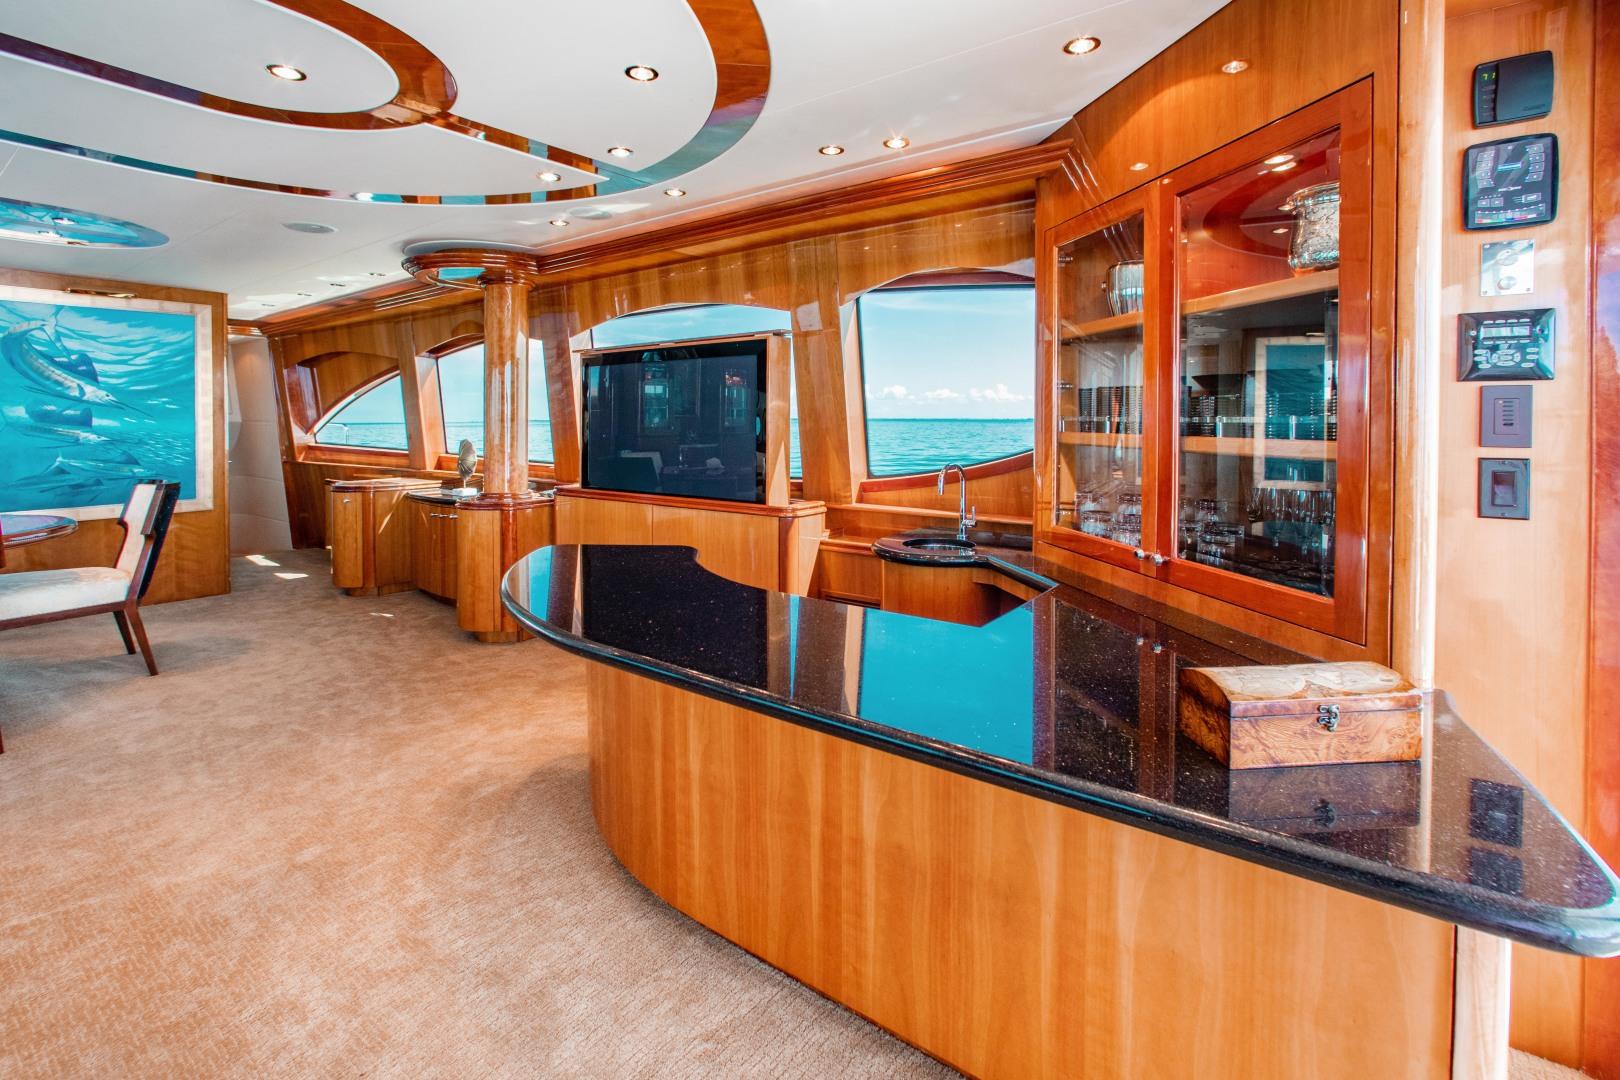 Hatteras-80 Motor Yacht 2008-Galati Yacht Sales Trade Anna Maria-Florida-United States-2008 Hatteras 80 Motor Yacht  Galati Yacht Sales Trade  Salon-1466249 | Thumbnail